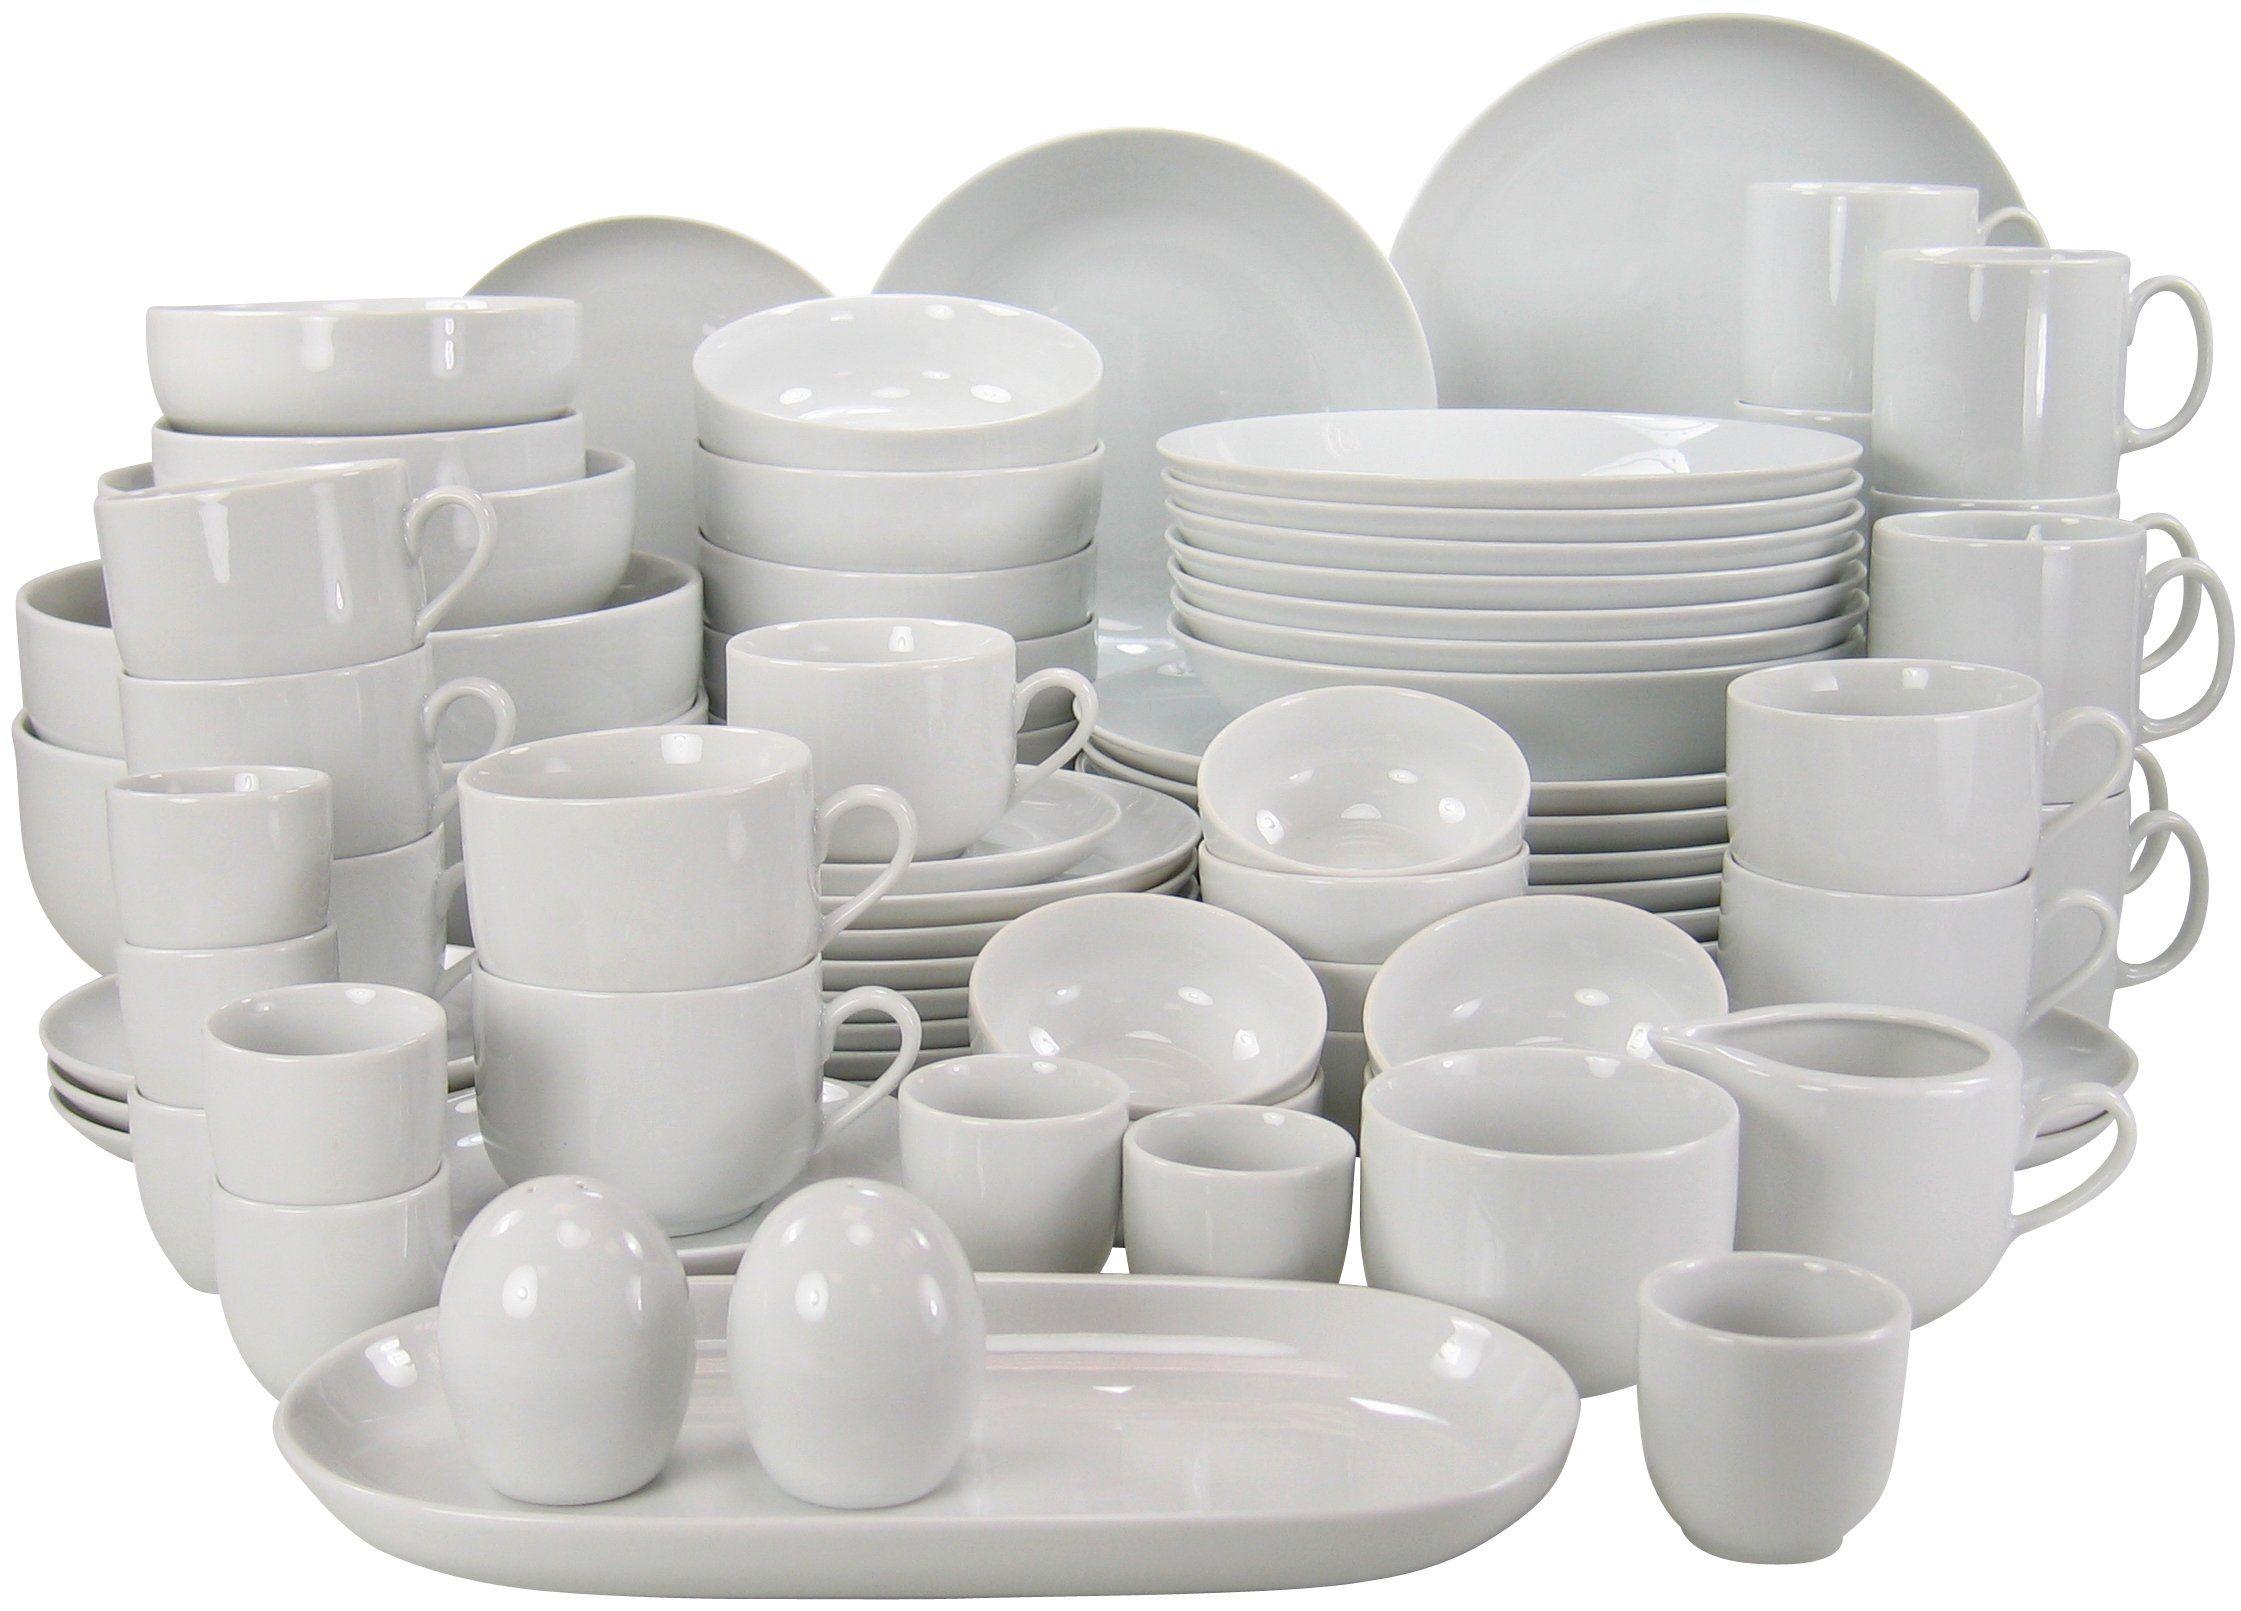 60 creatable 80 piece dinner set atelier amazon co uk kitchen